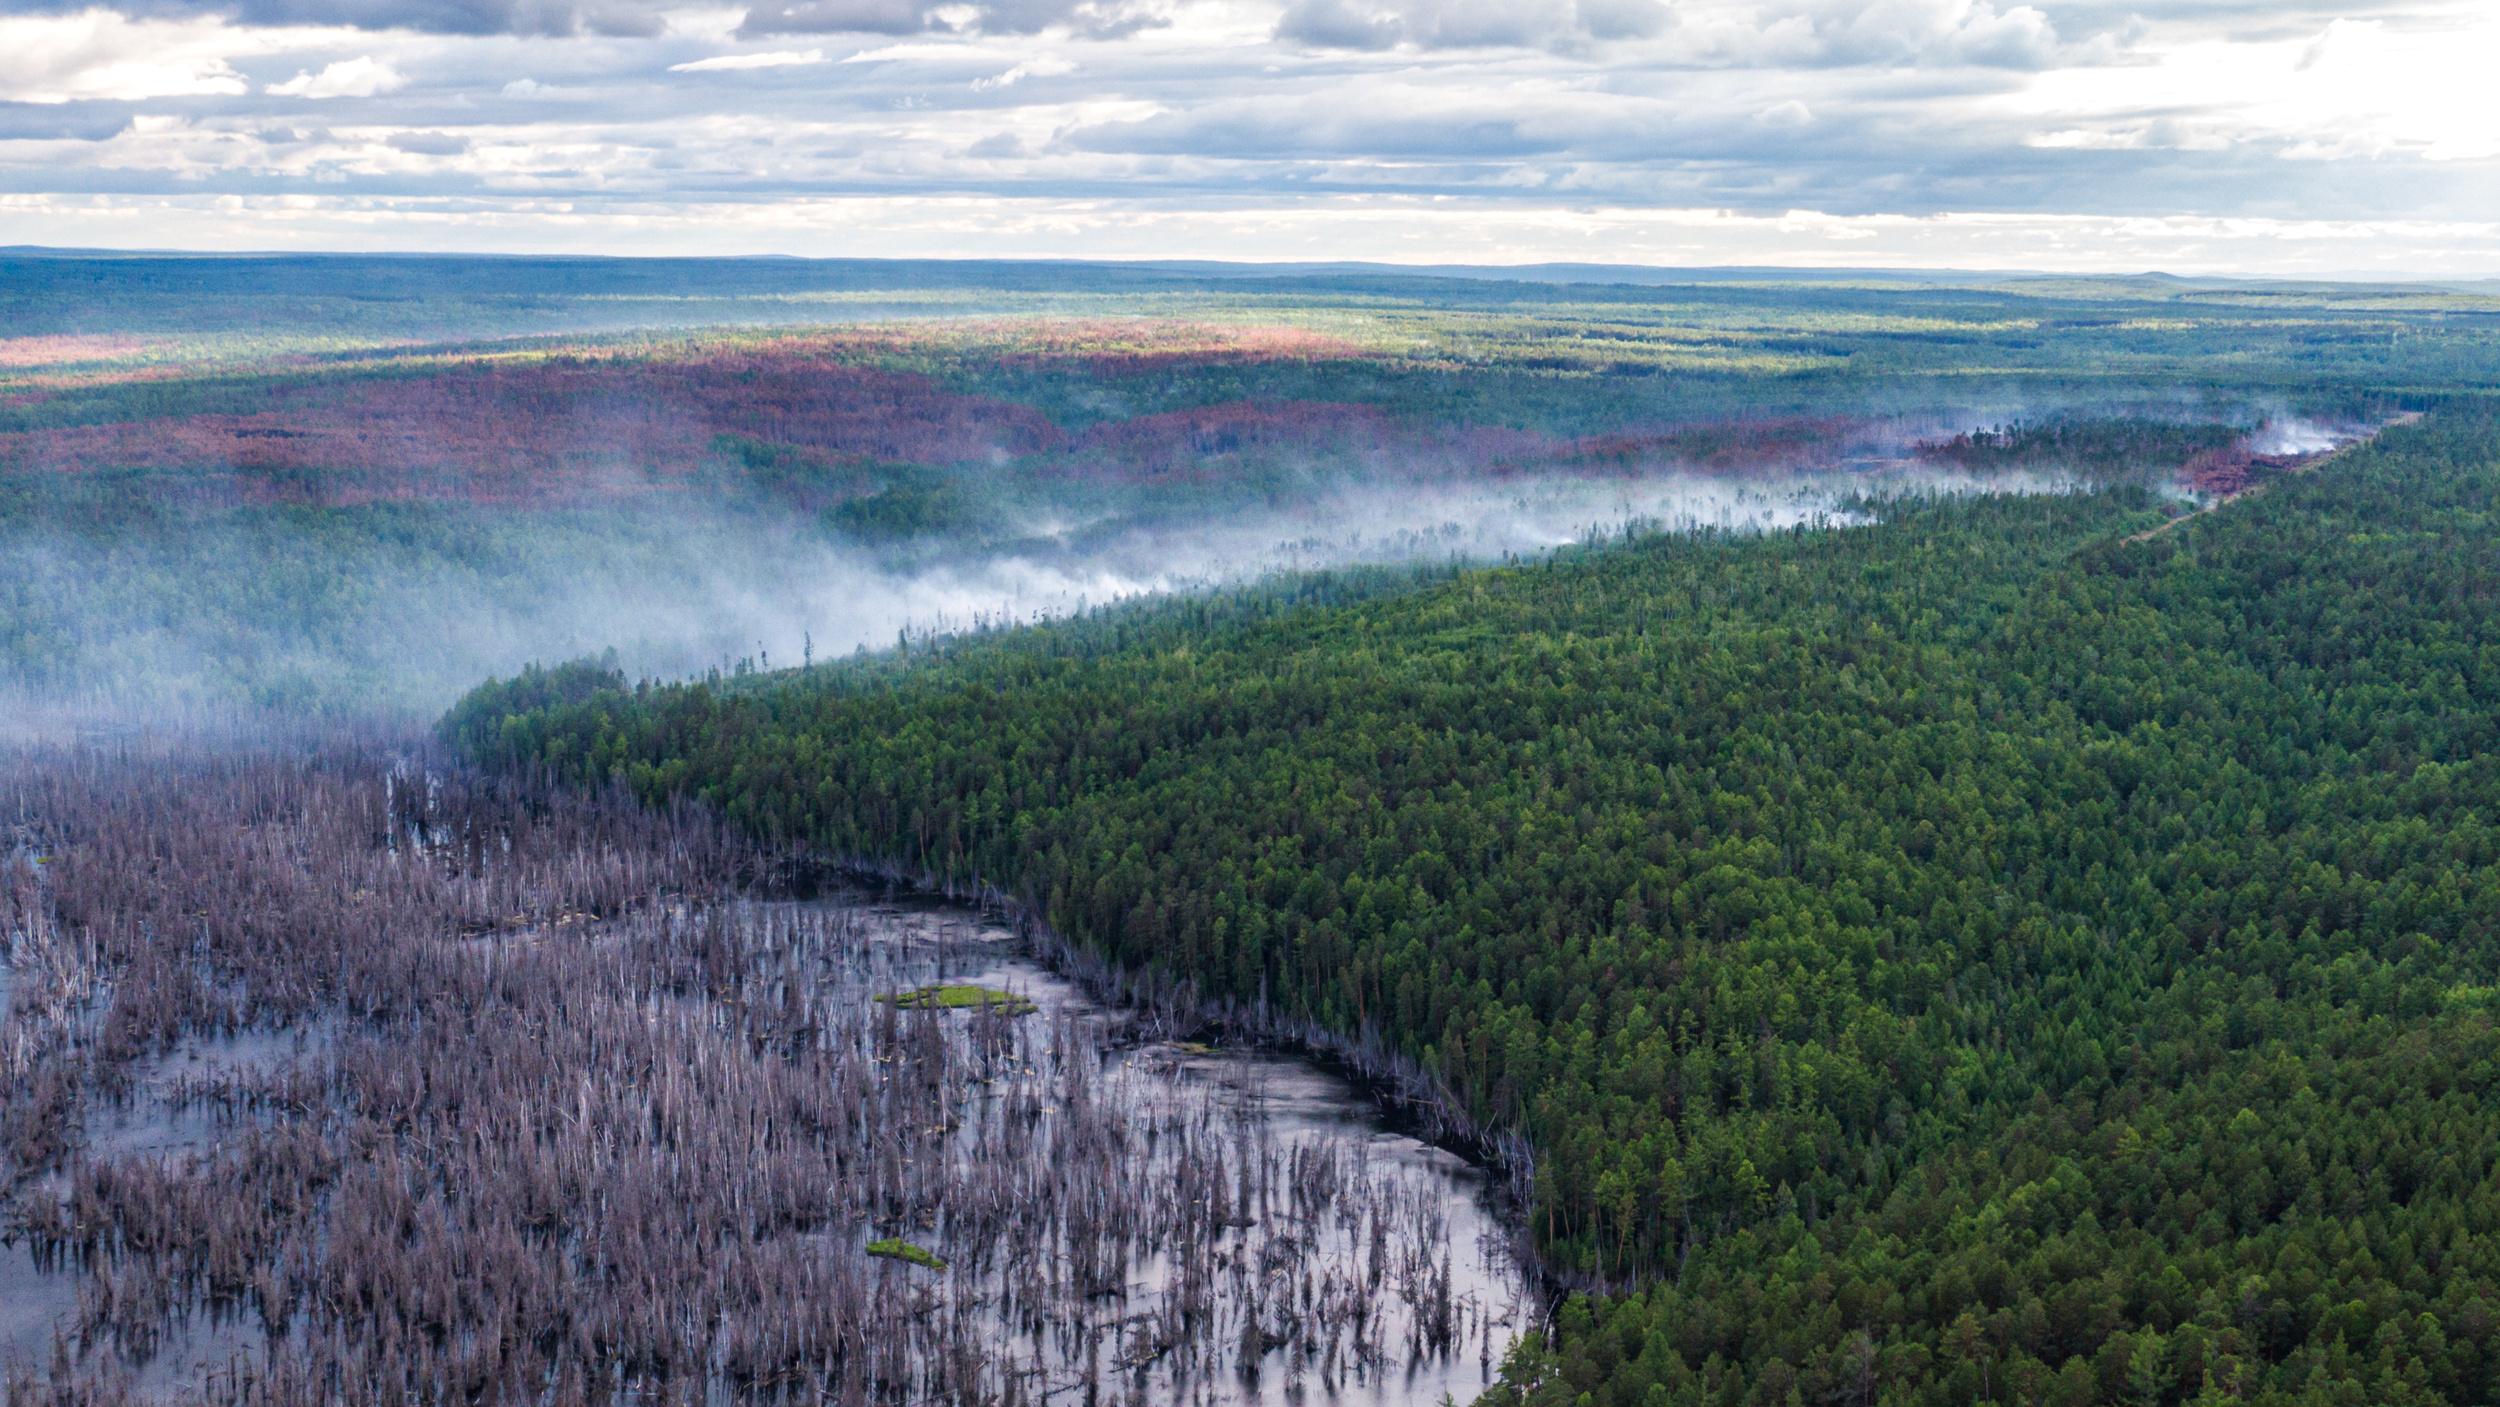 (Julia Petrenko/Greenpeace via REUTERS)